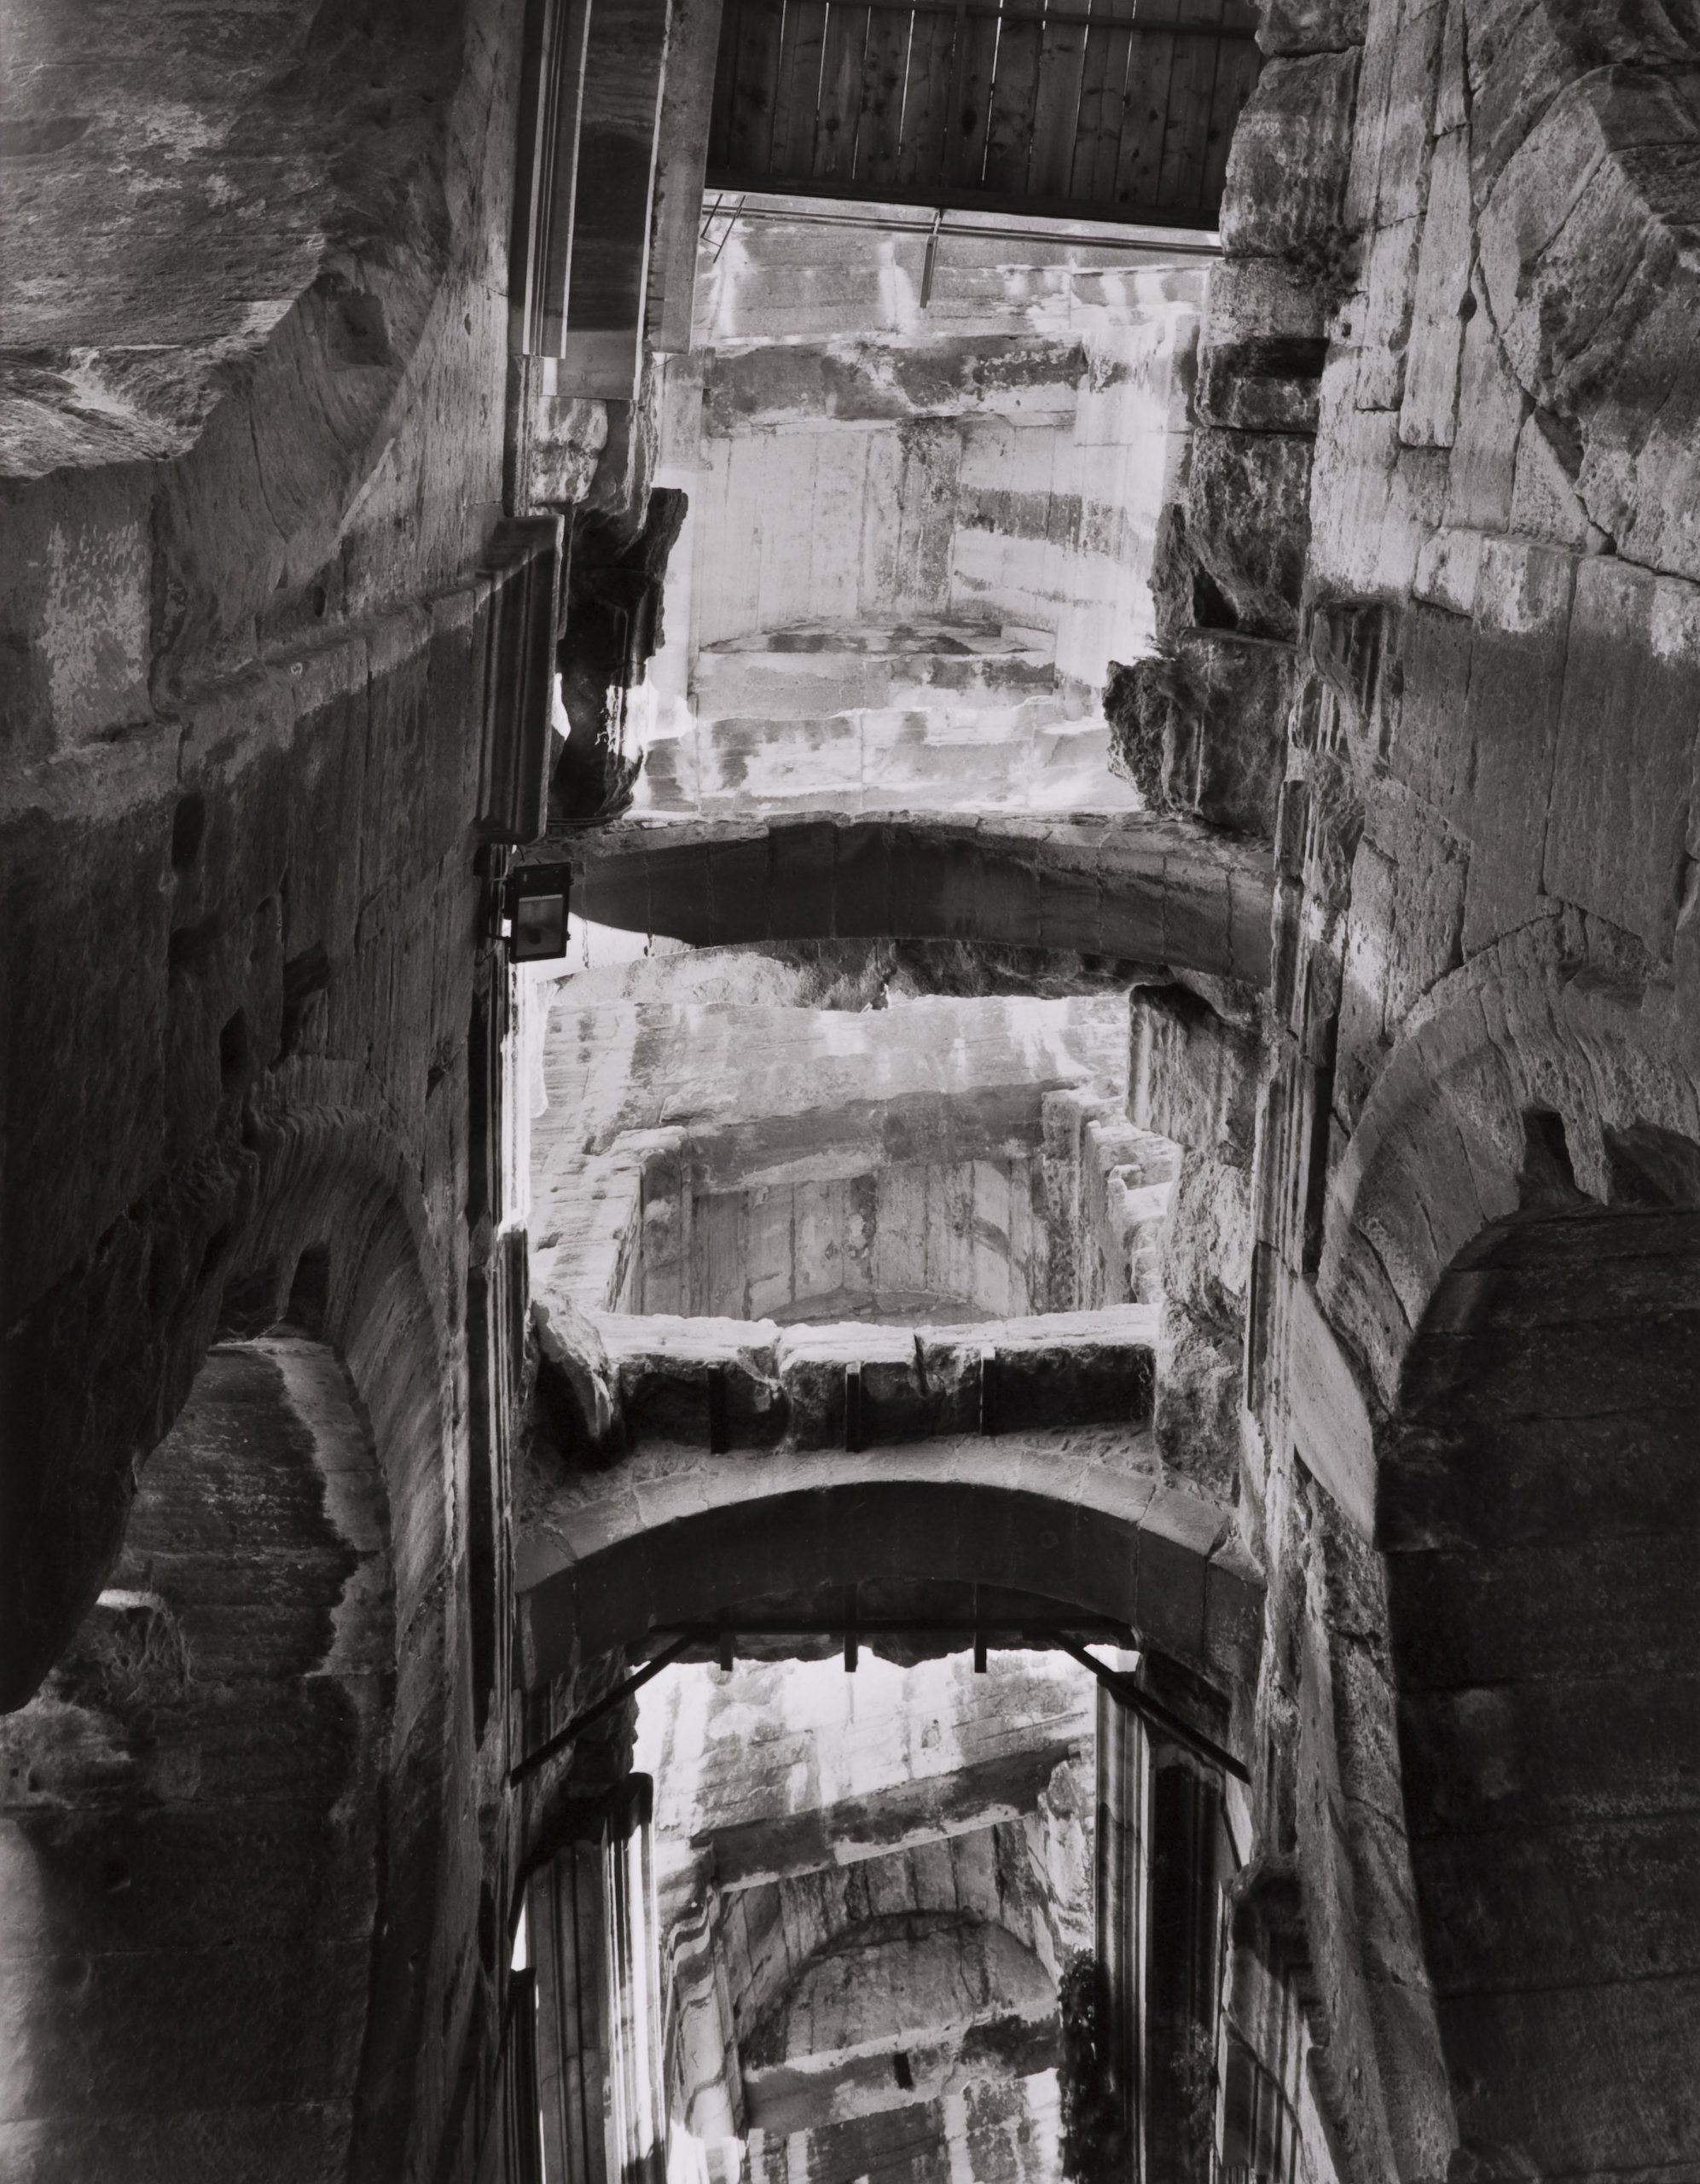 Basilico, Gabriele 19